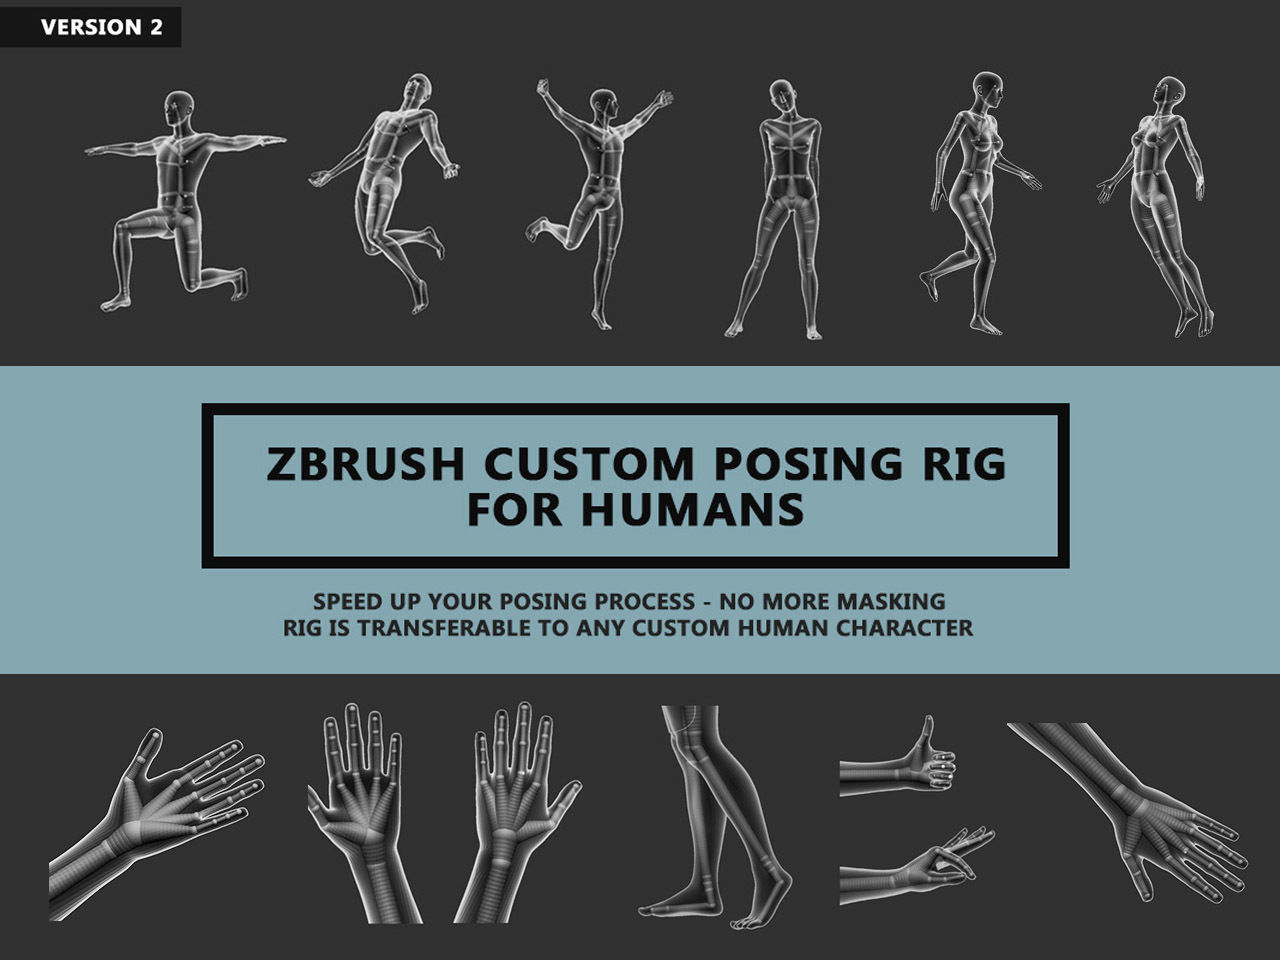 Zbrush Custom Posing Rig Tool For Humans V2